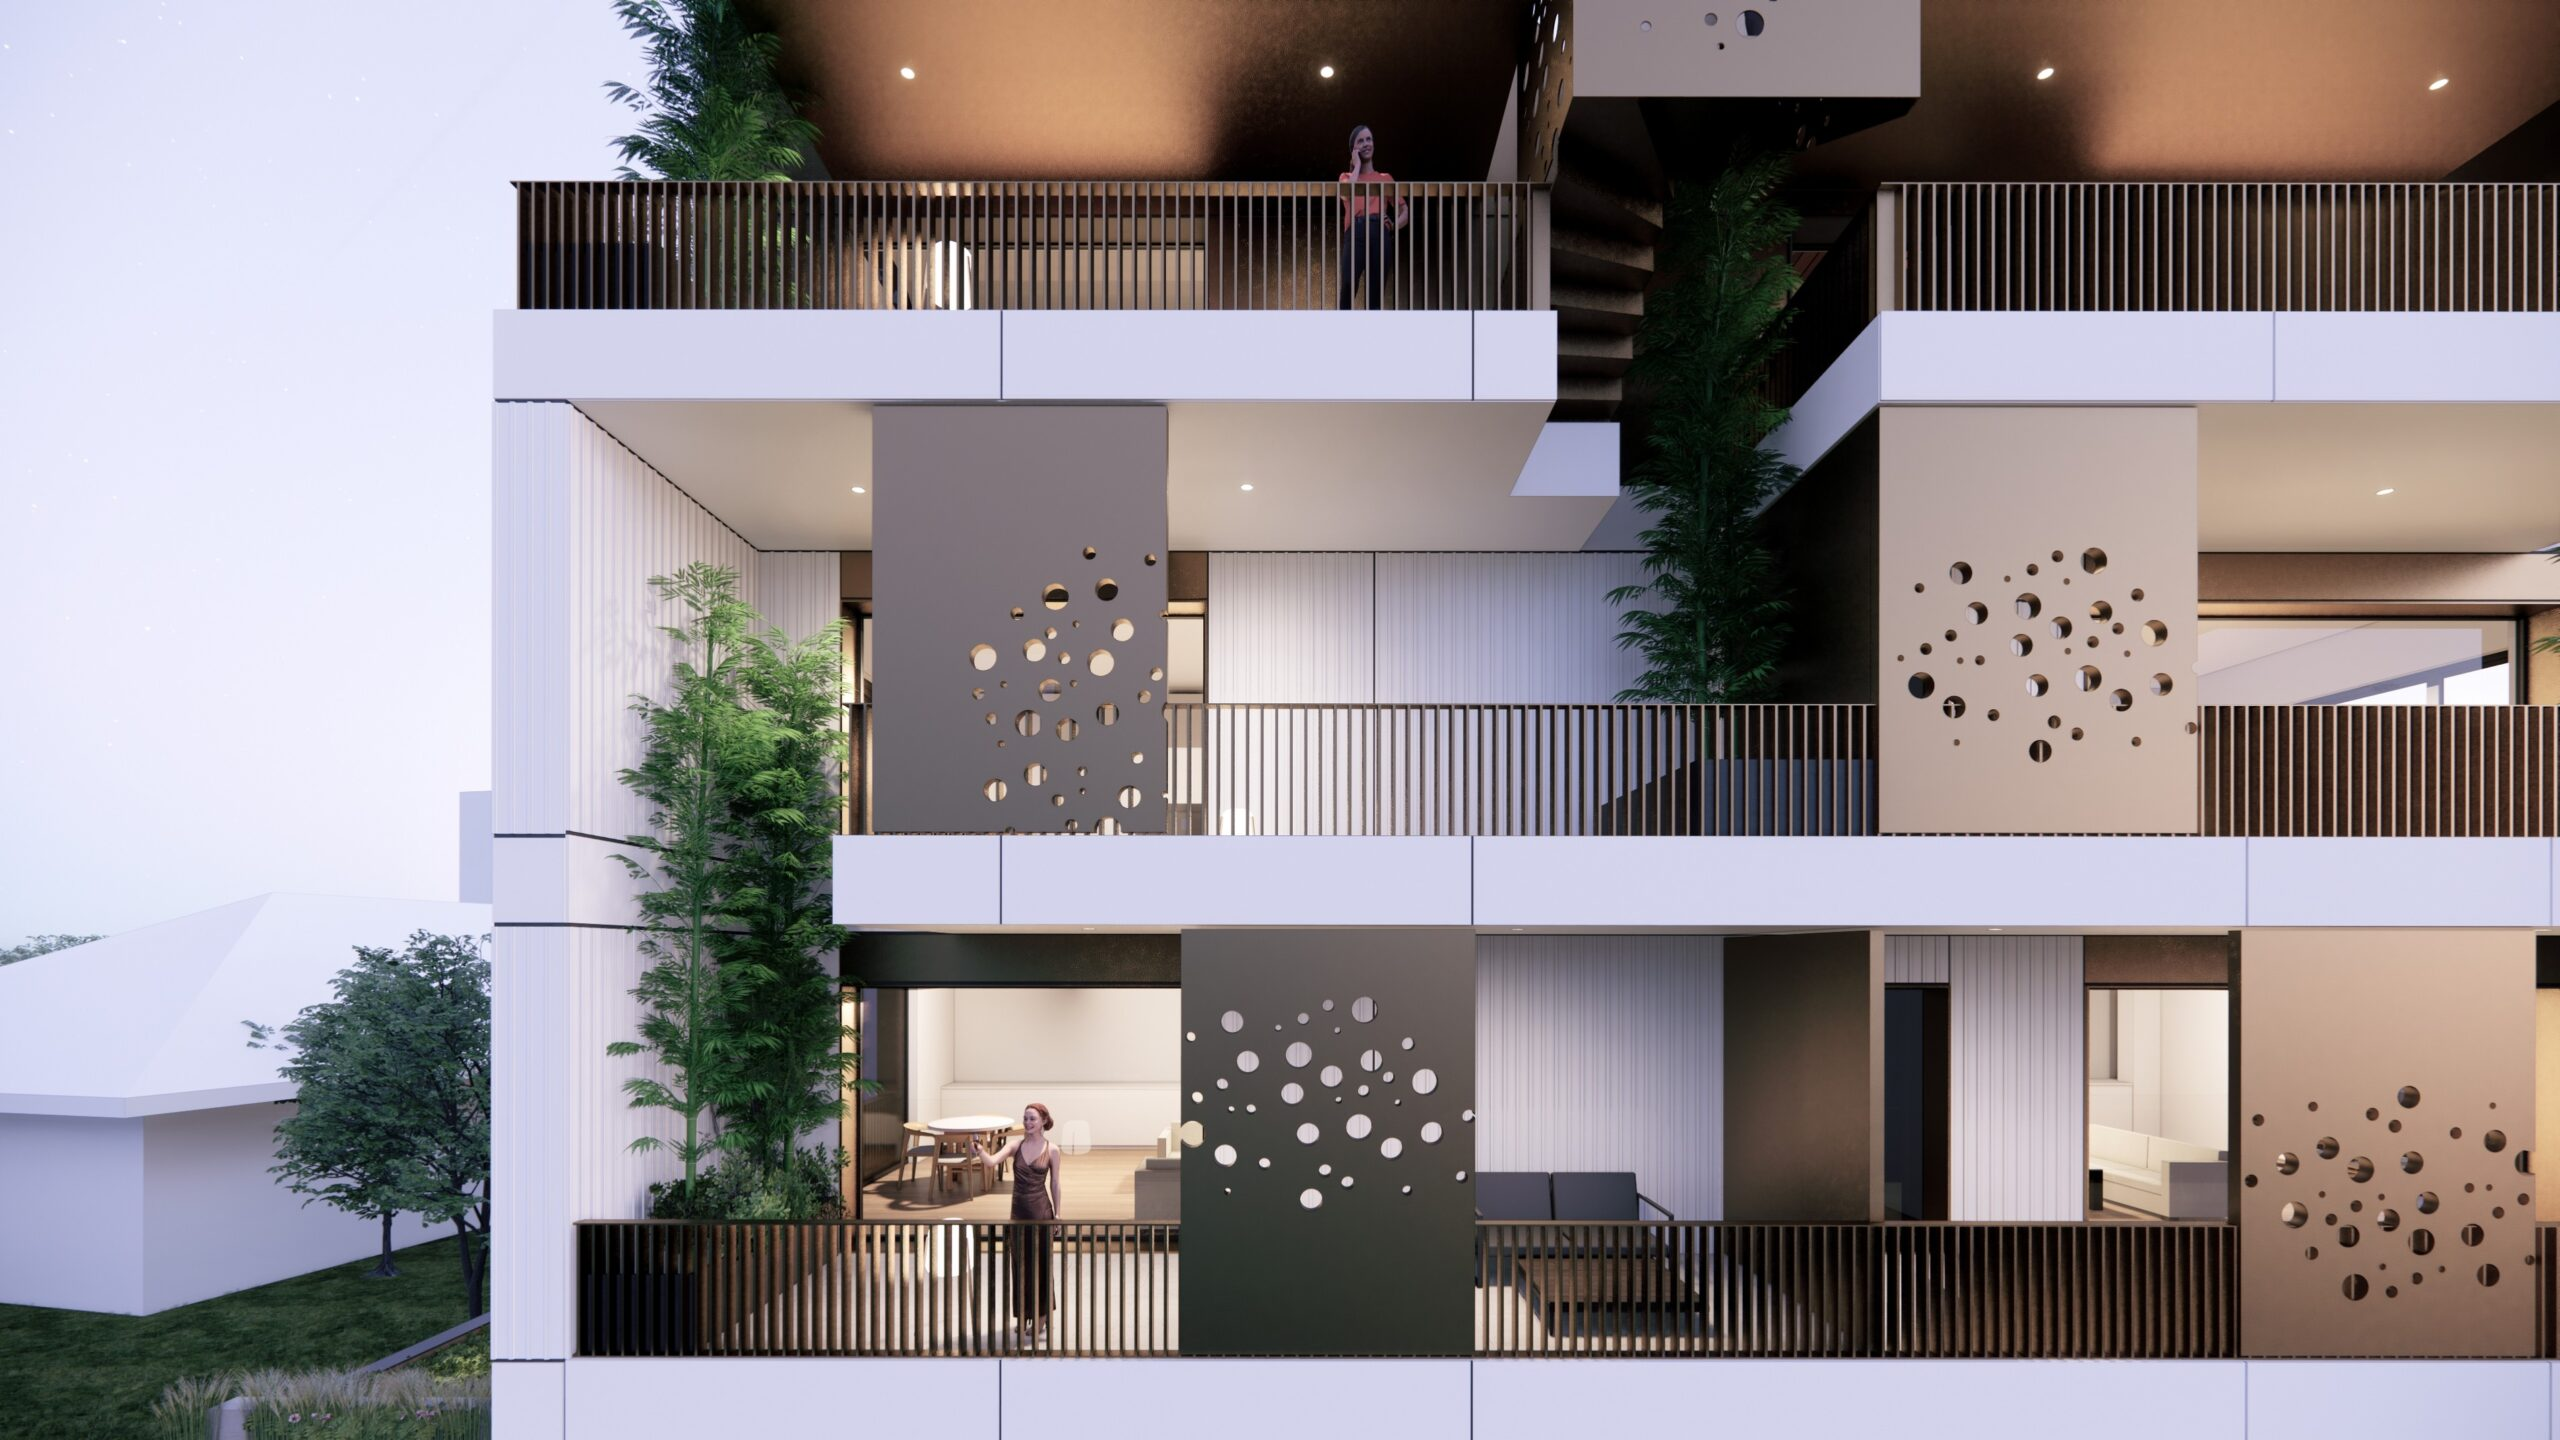 https://nbc-arhitect.ro/wp-content/uploads/2021/09/Jandarmeriei-7-Master-scaled.jpg